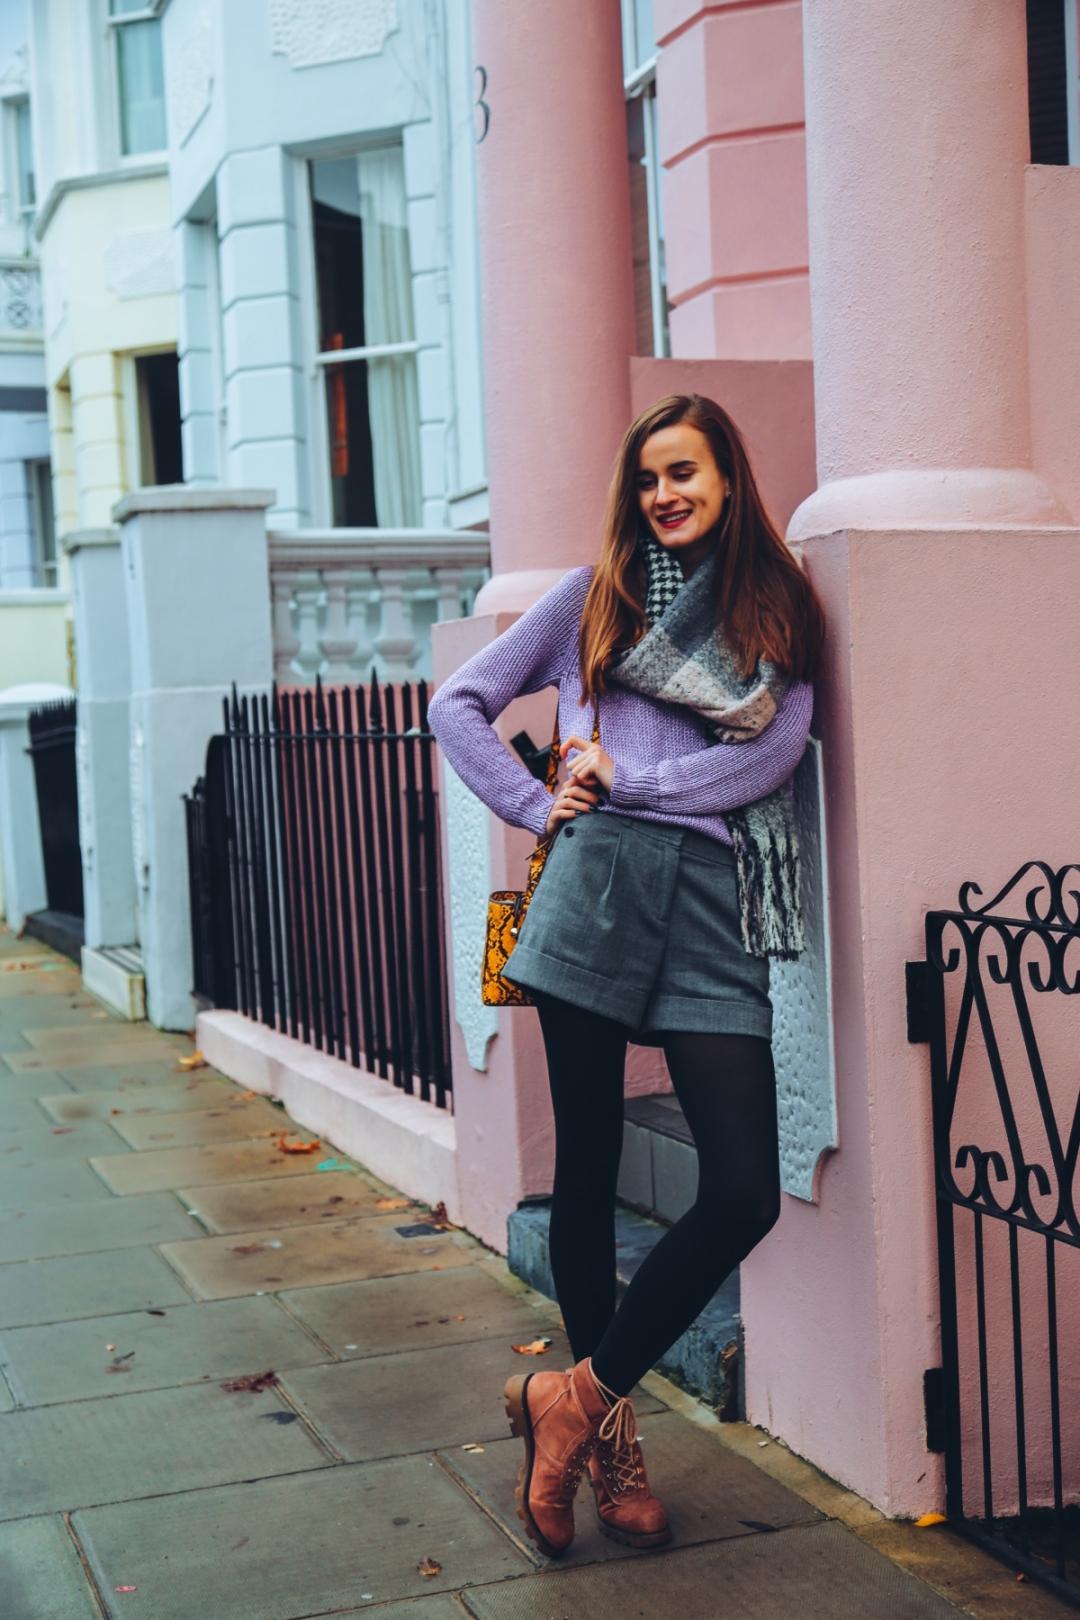 Розови къщи в Нотинг Хил Лондон